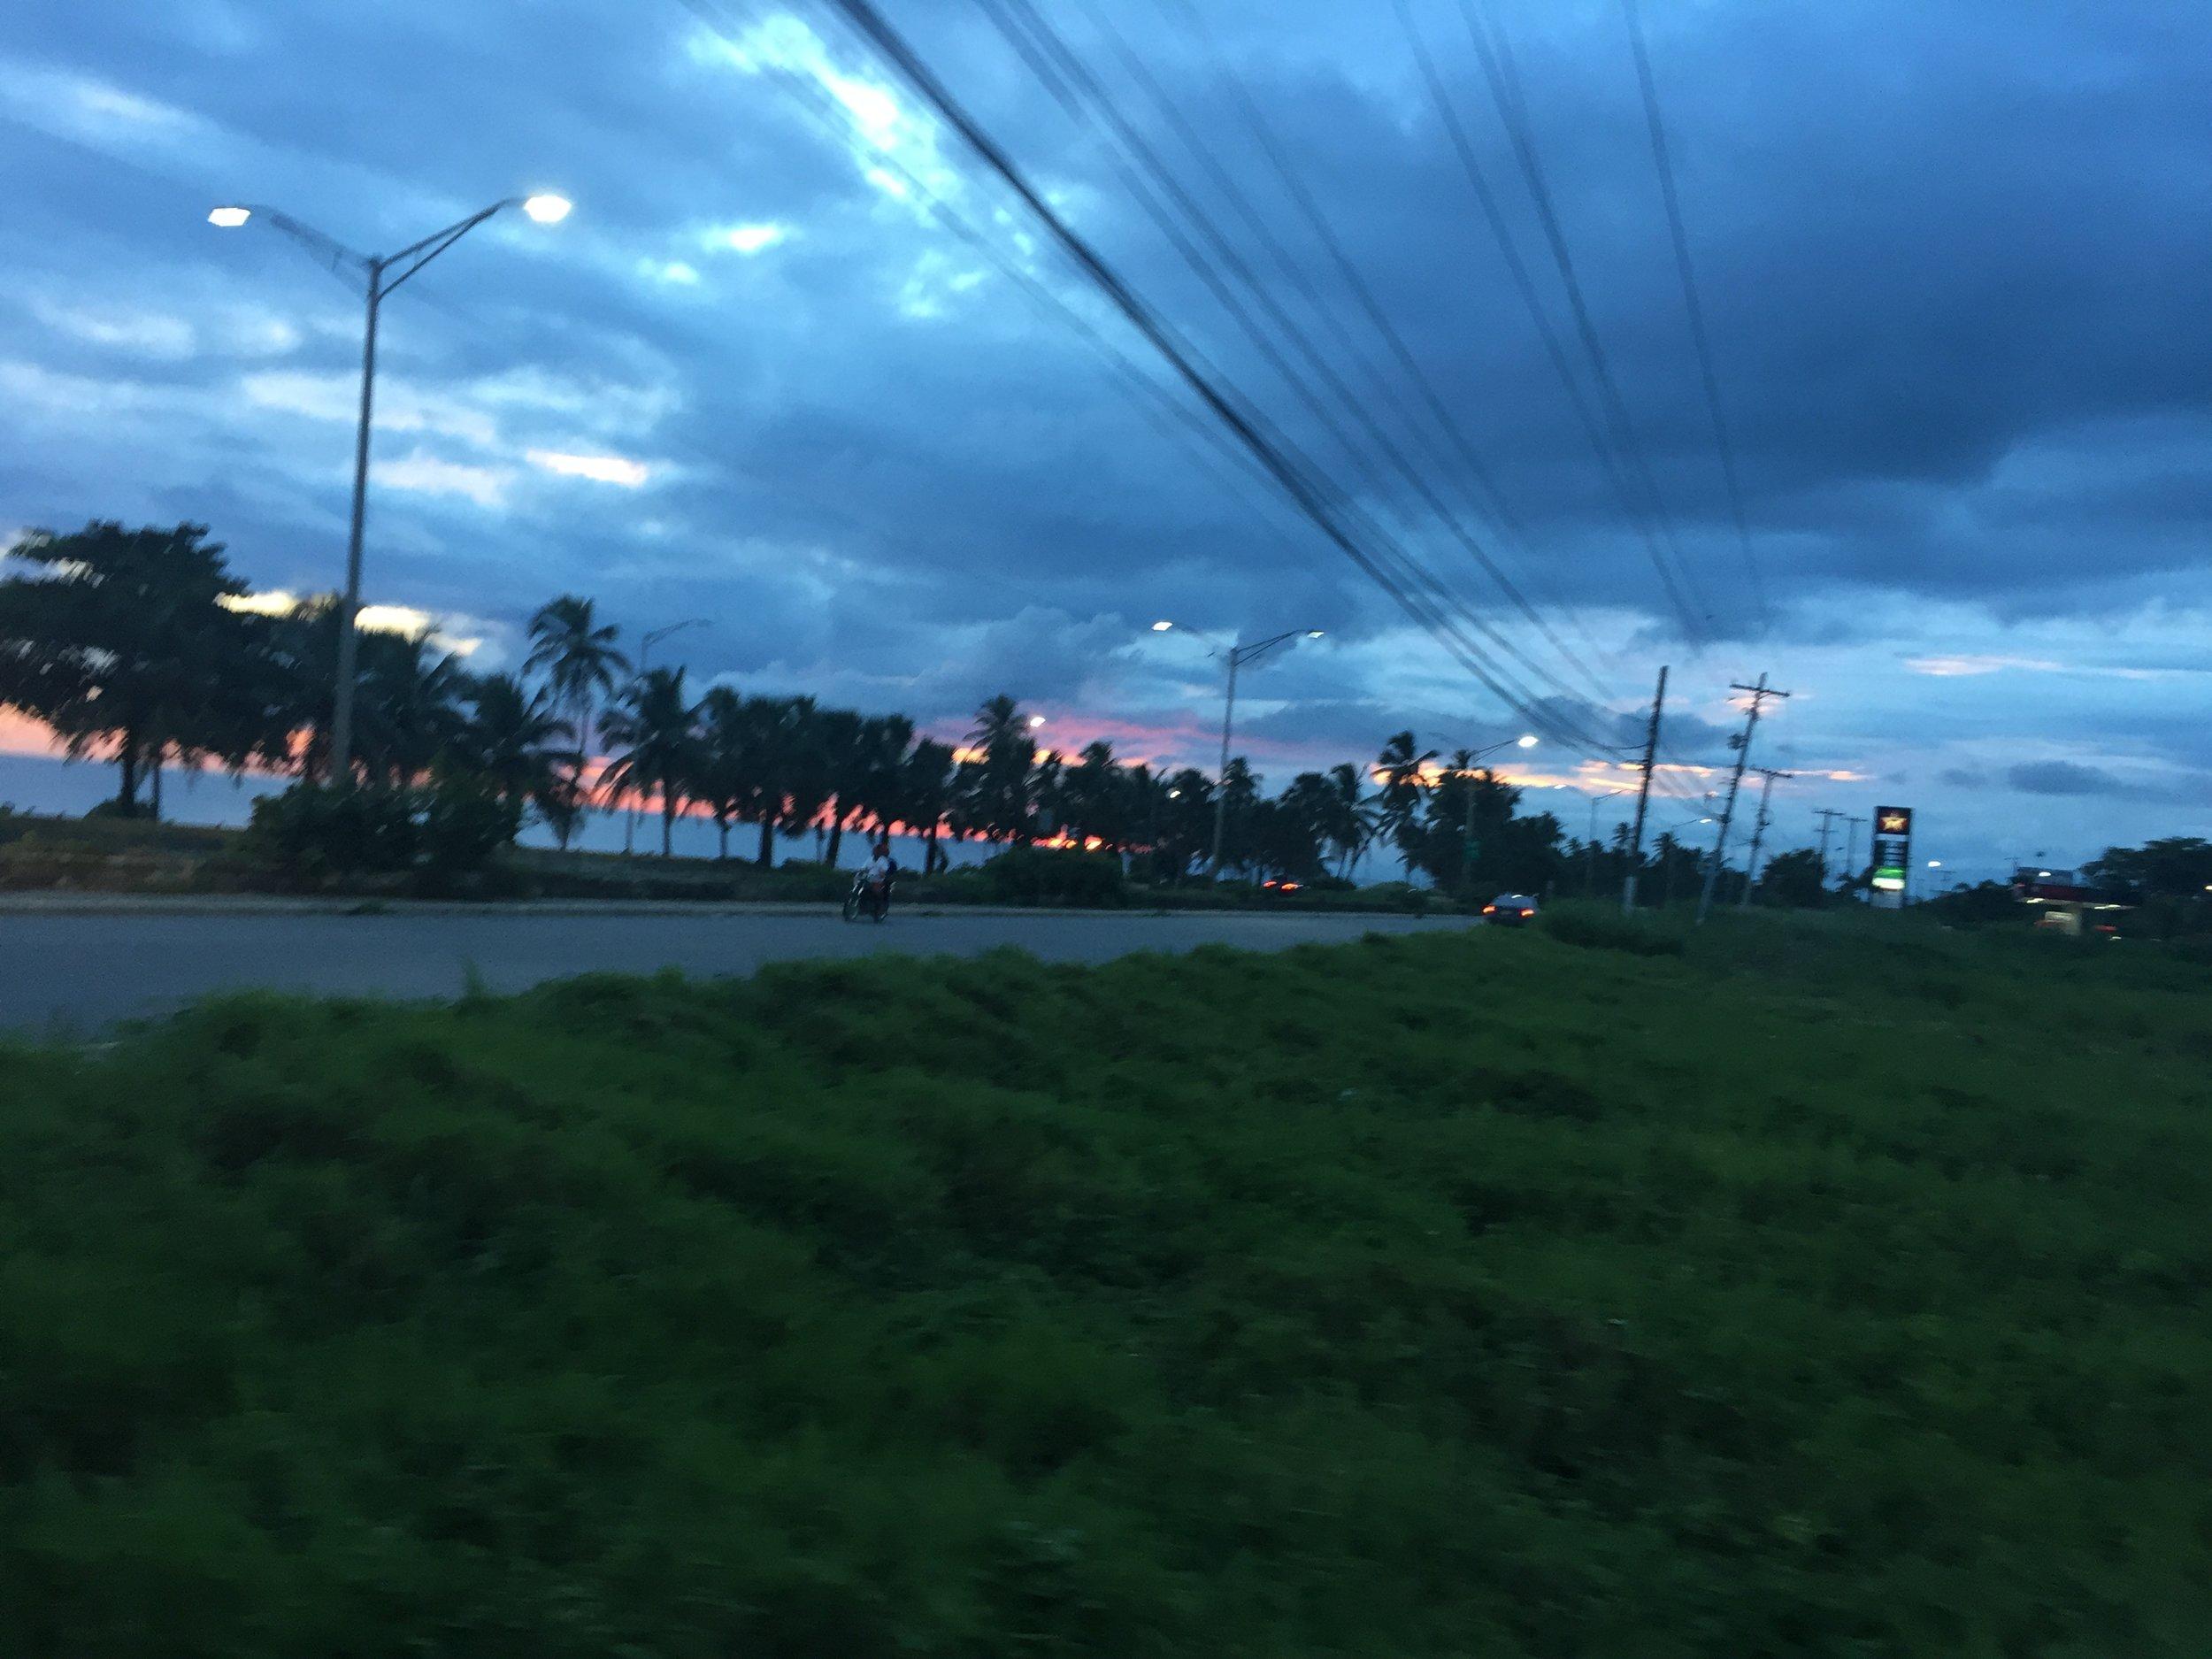 DR1116 Hwy sunset 1.JPG